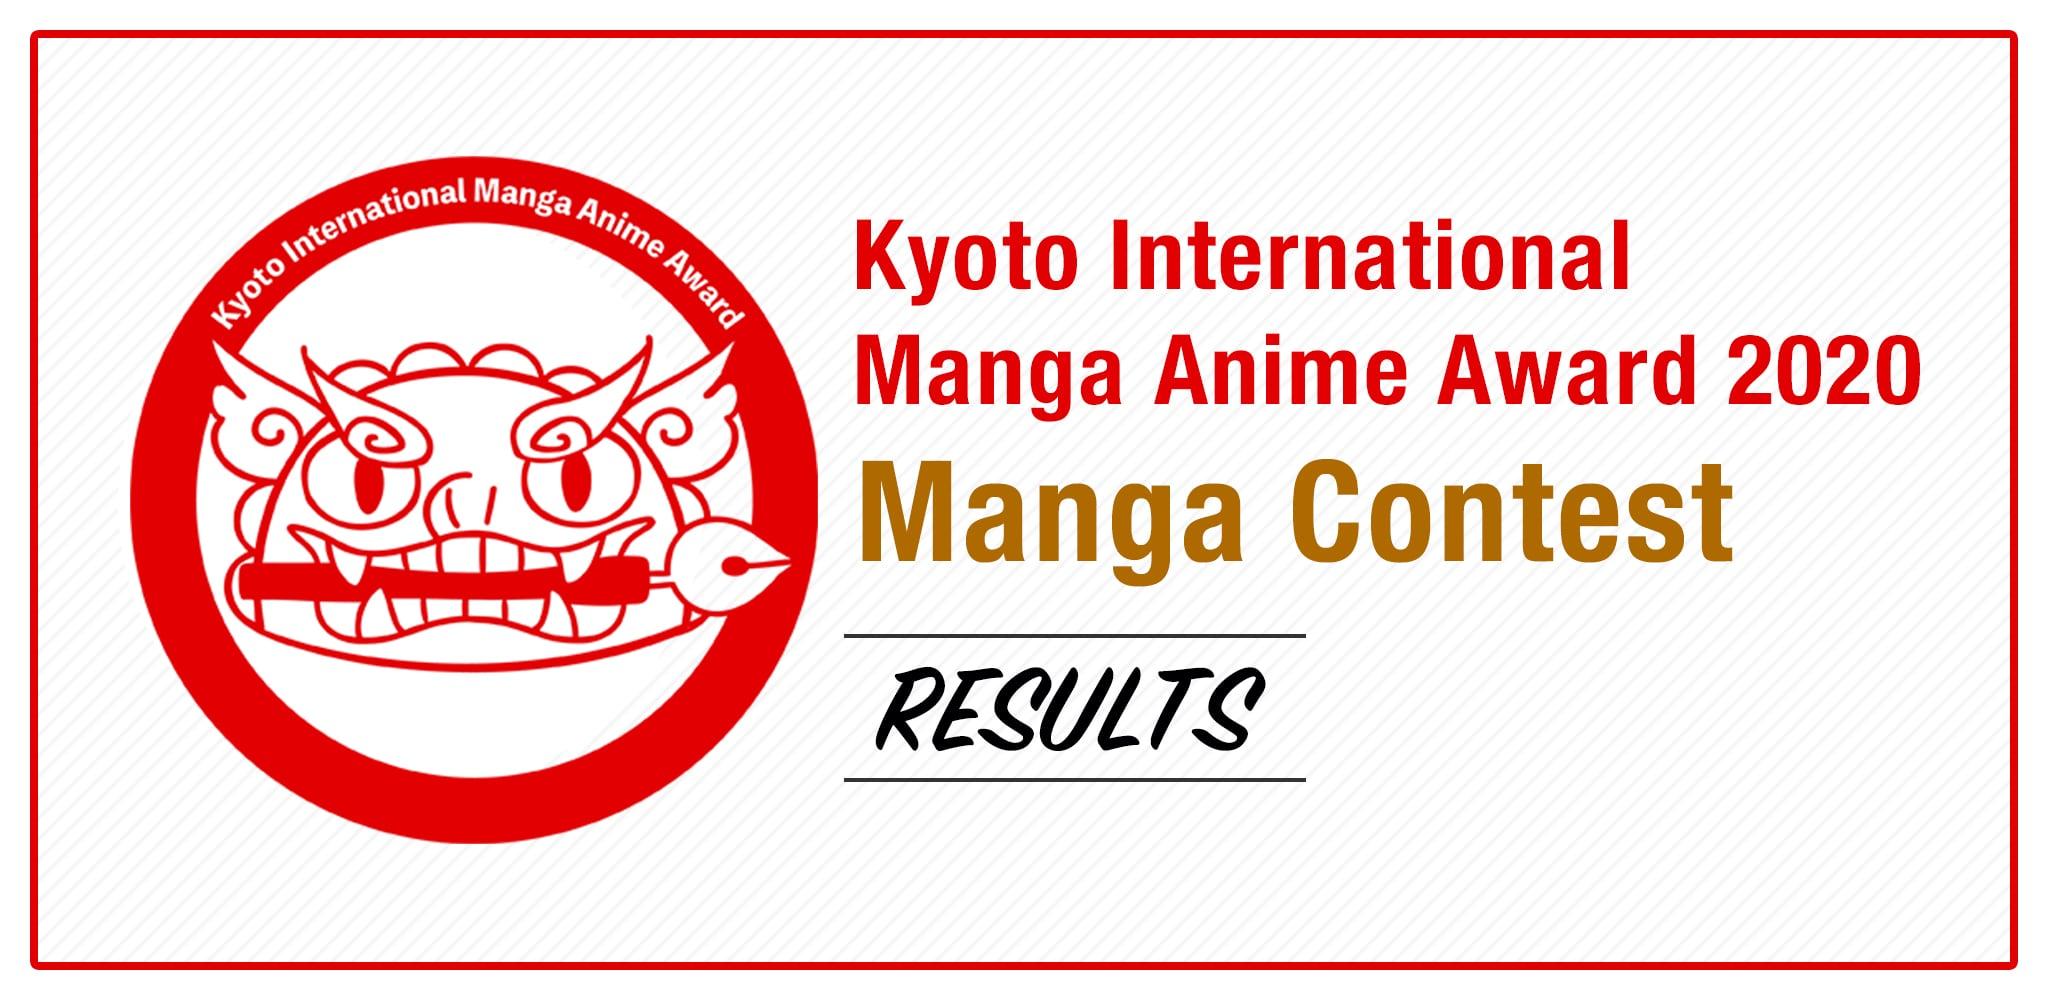 Kyoto International Manga Award 2020 Results | Contest  - ART street by MediBang